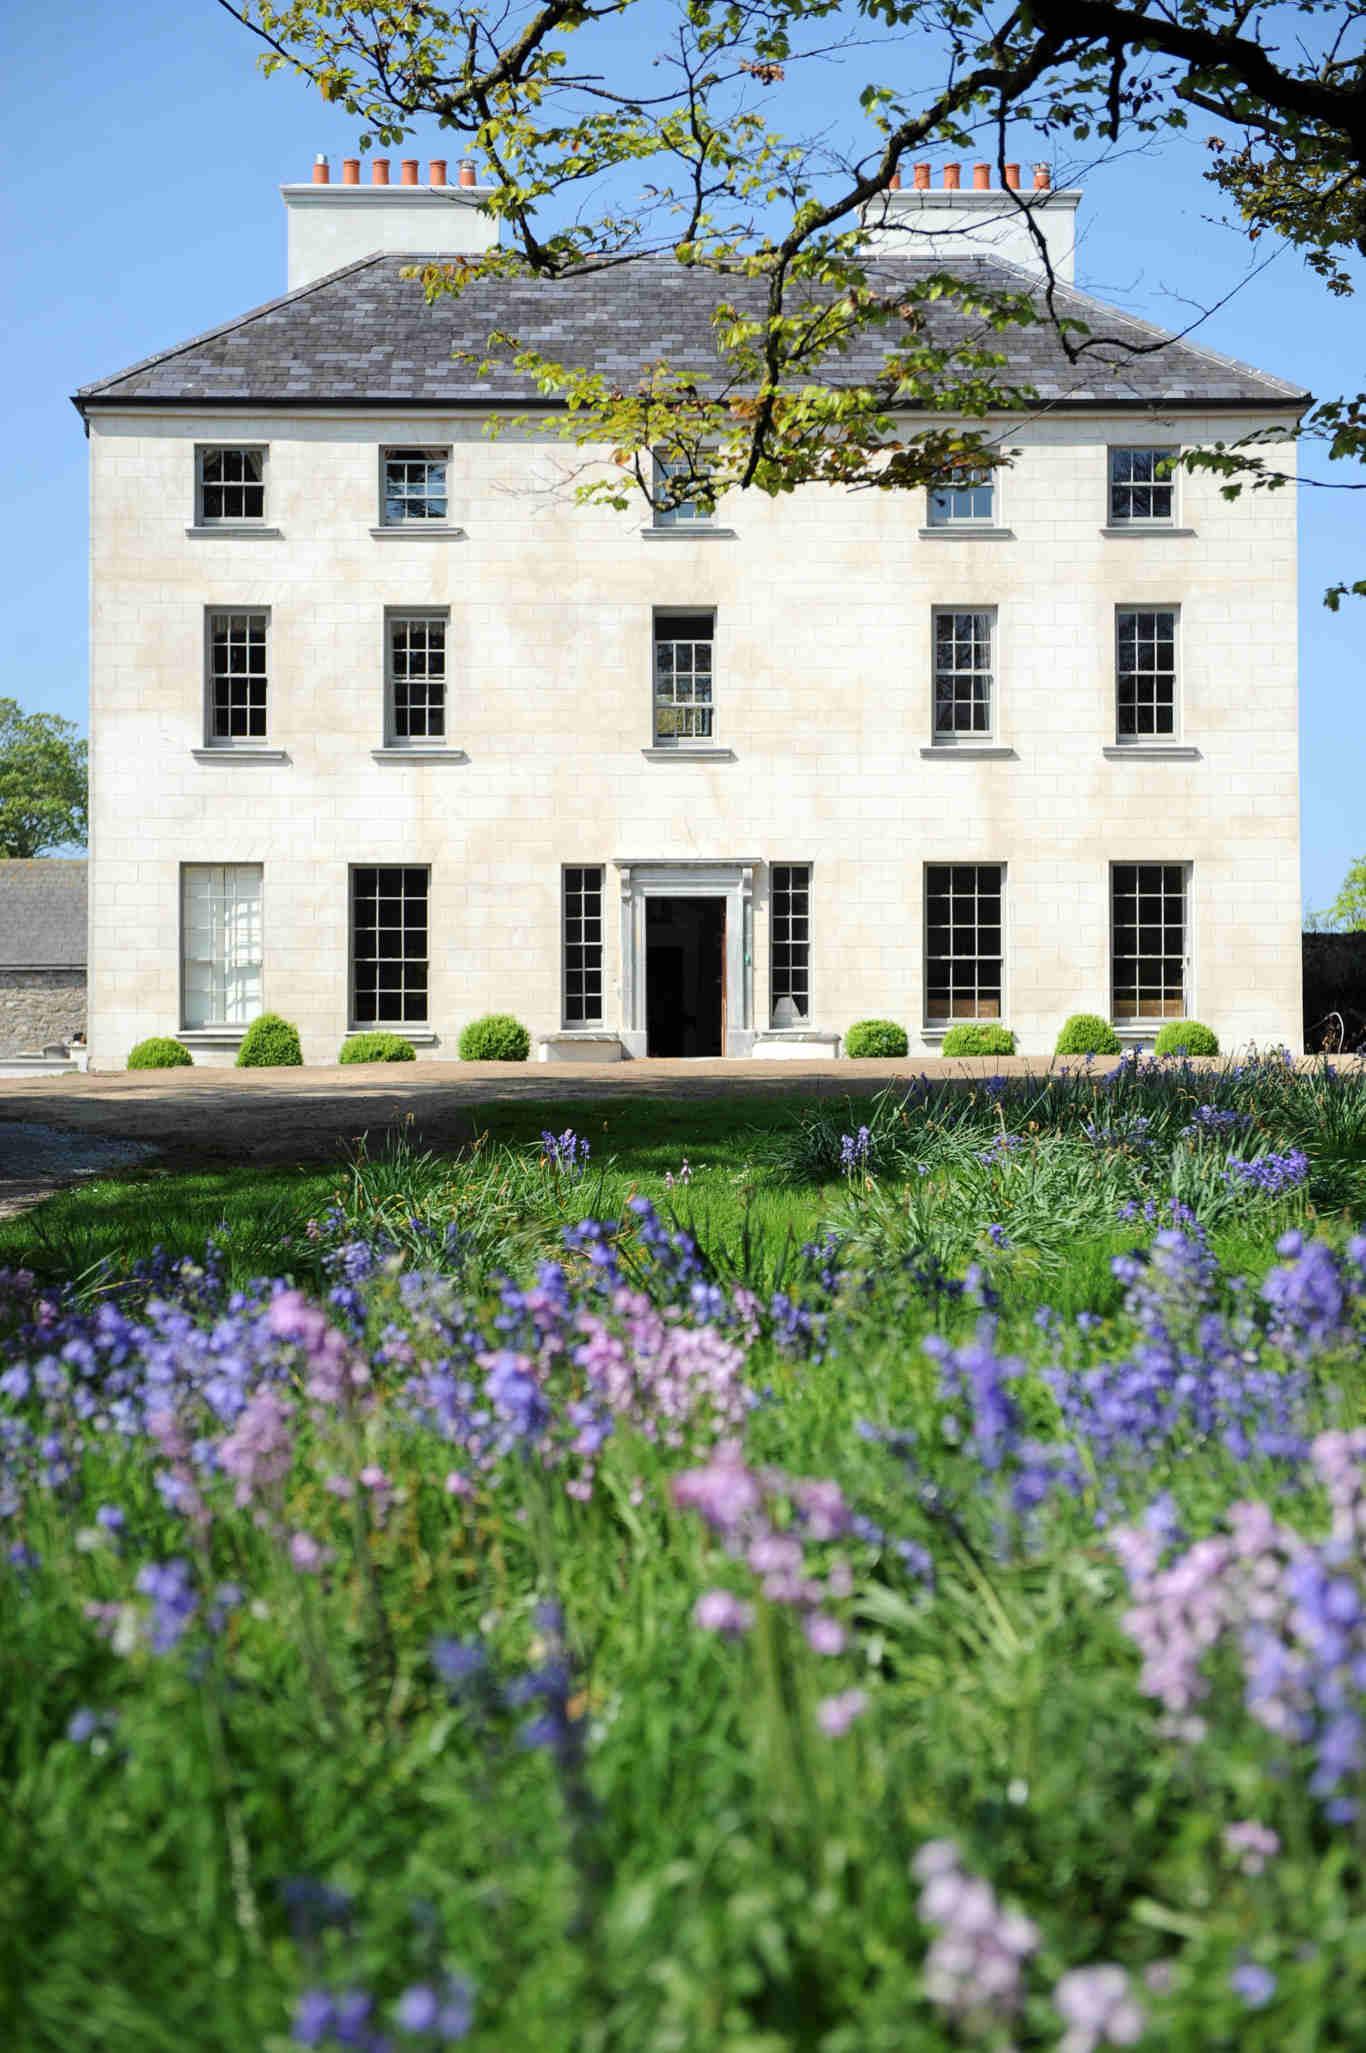 churchtown-house-escapada-retreat